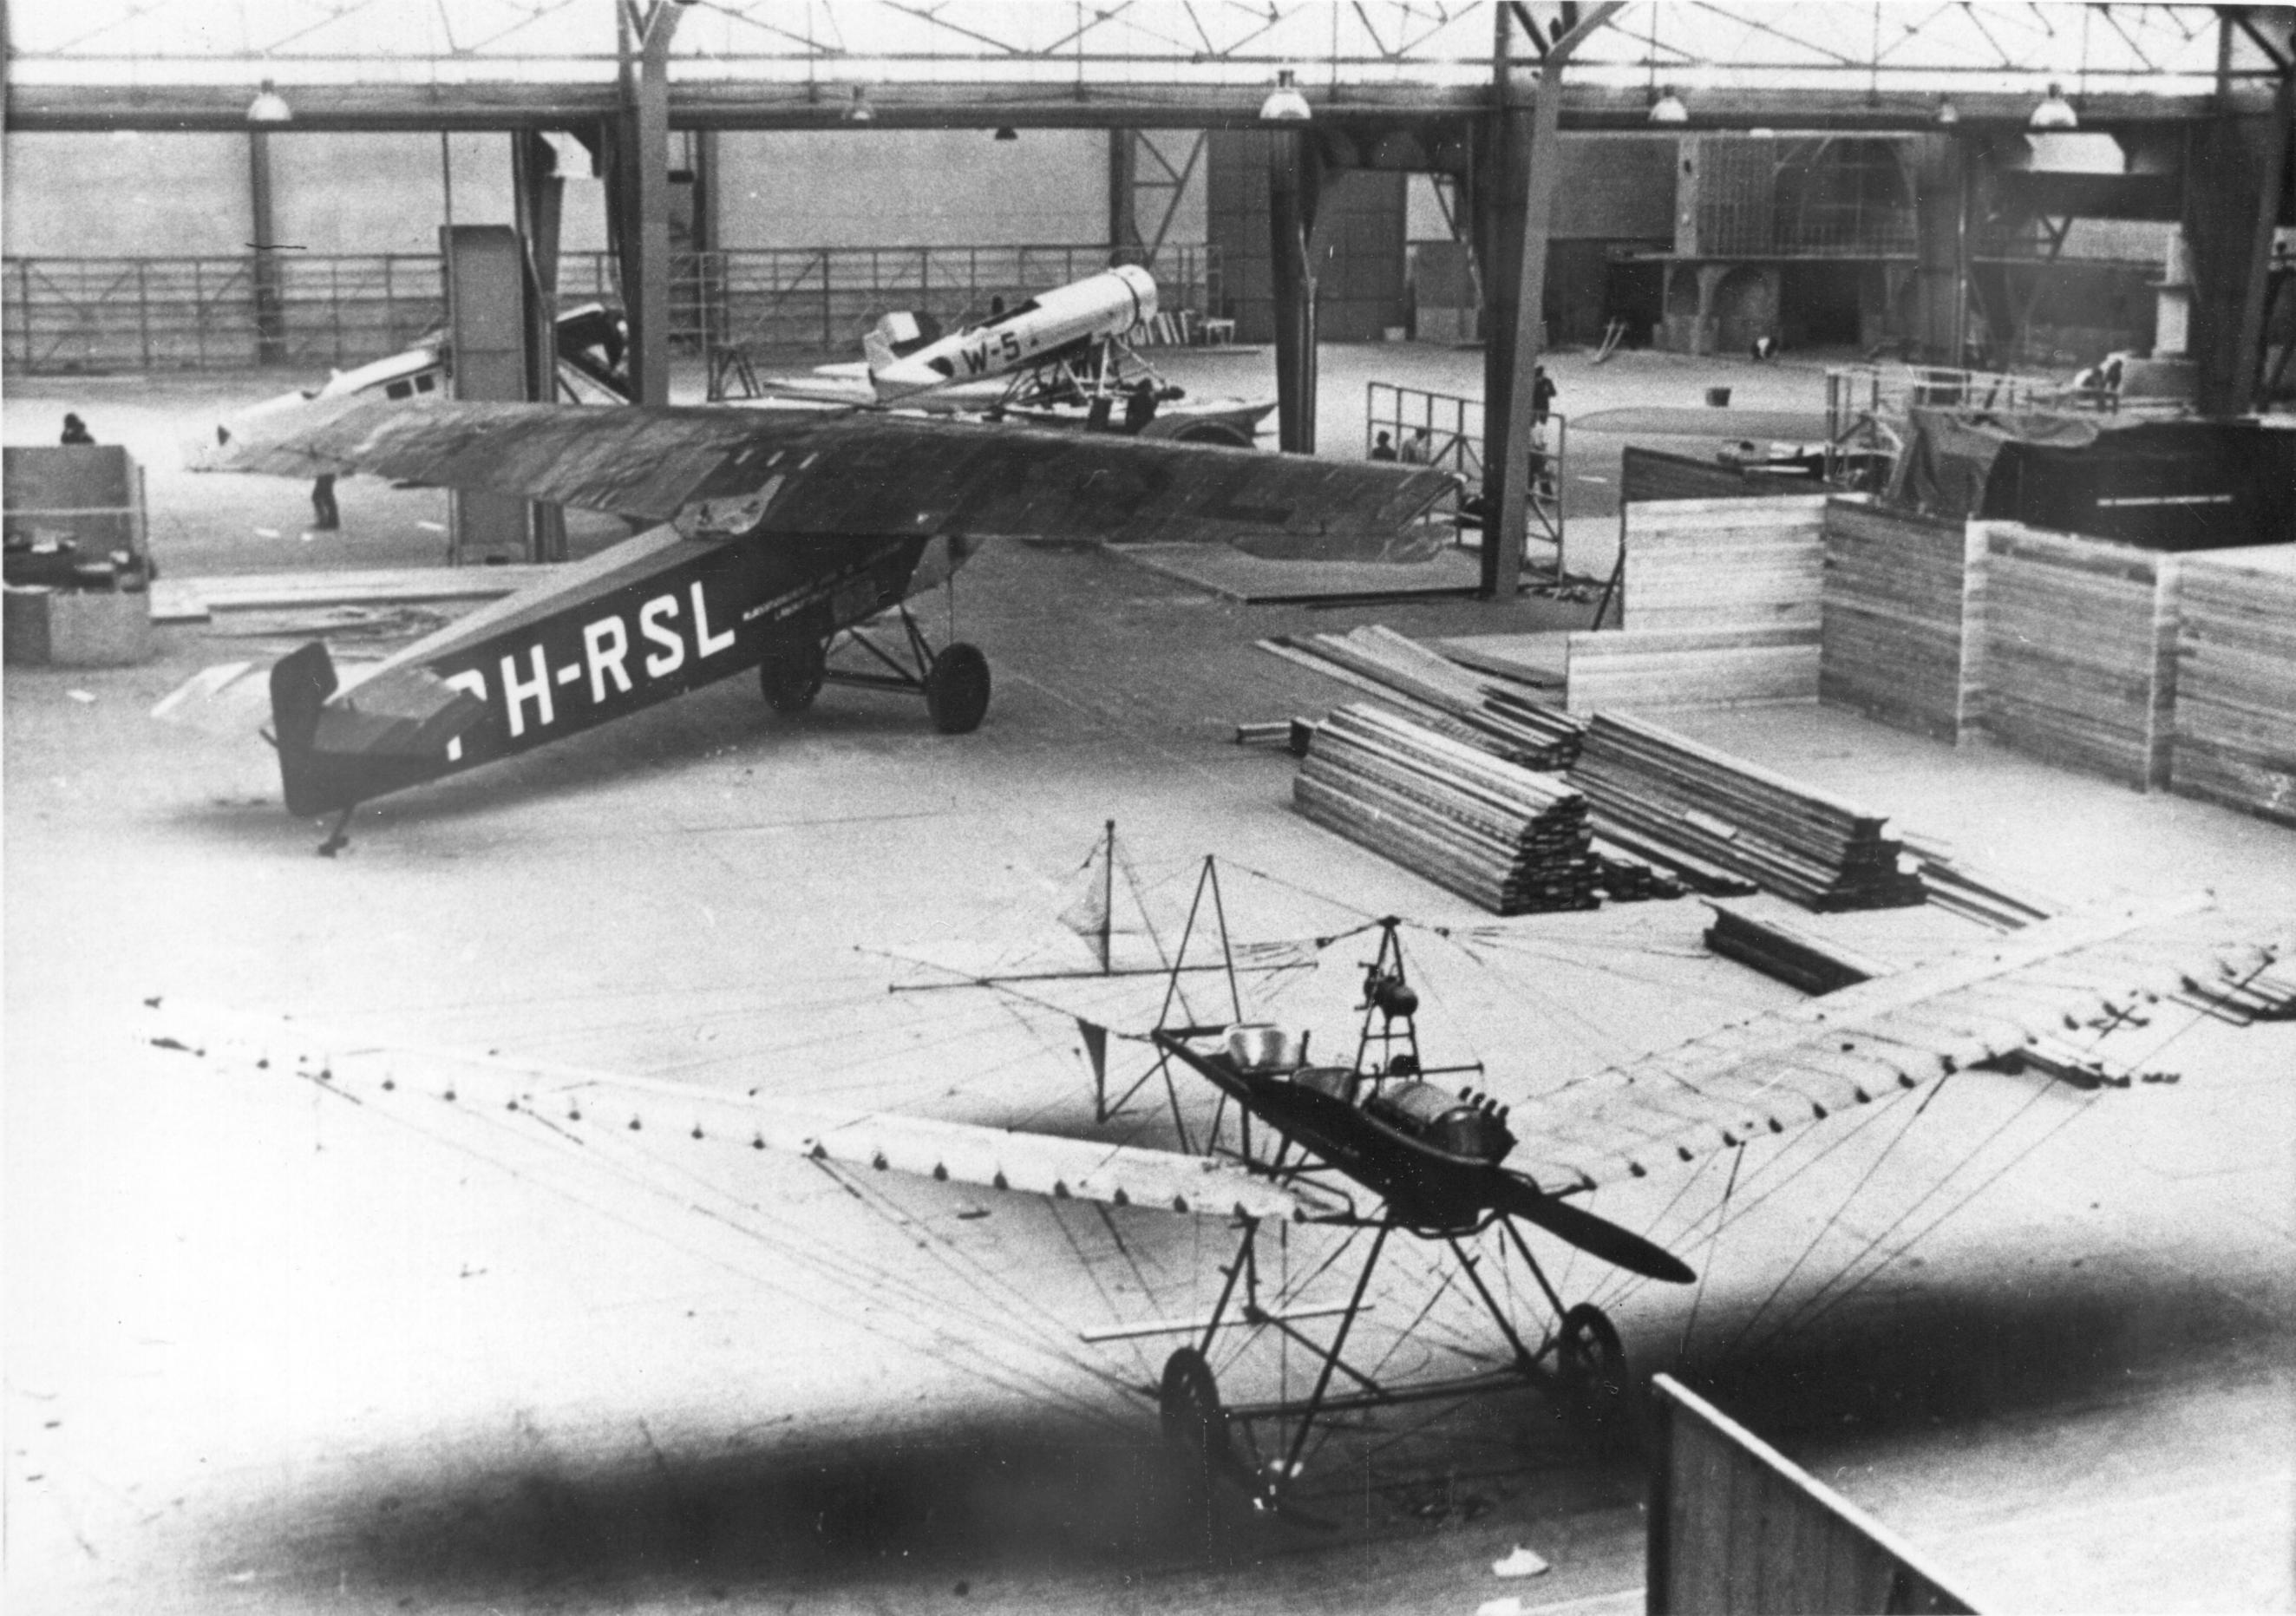 Naam: Schiphol 1939 FK26, C-11, F-7a, Spin via GJTORNIJ.jpg Bekeken: 99 Grootte: 515,8 KB